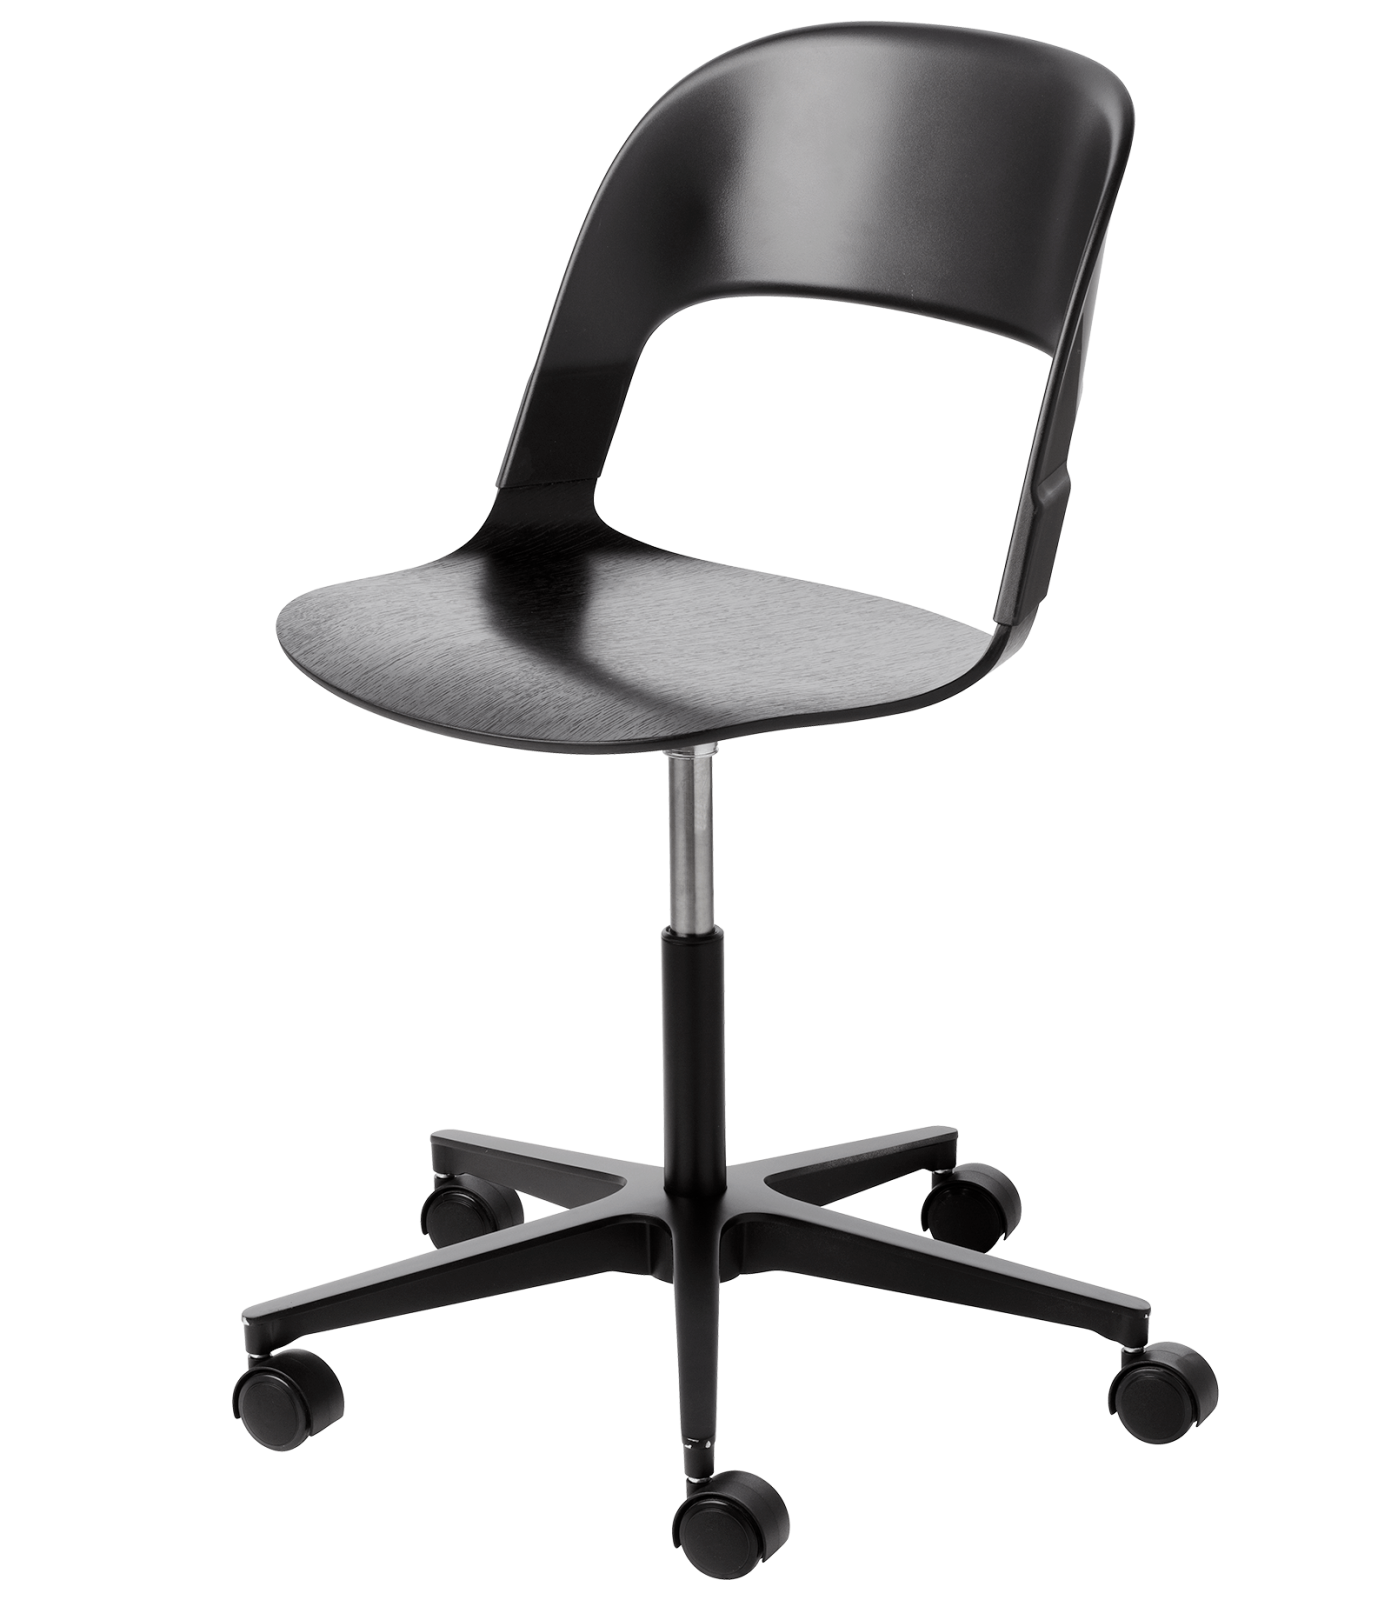 Pair Chair - star base Black Lacquered Oak Black Black Powder Coated